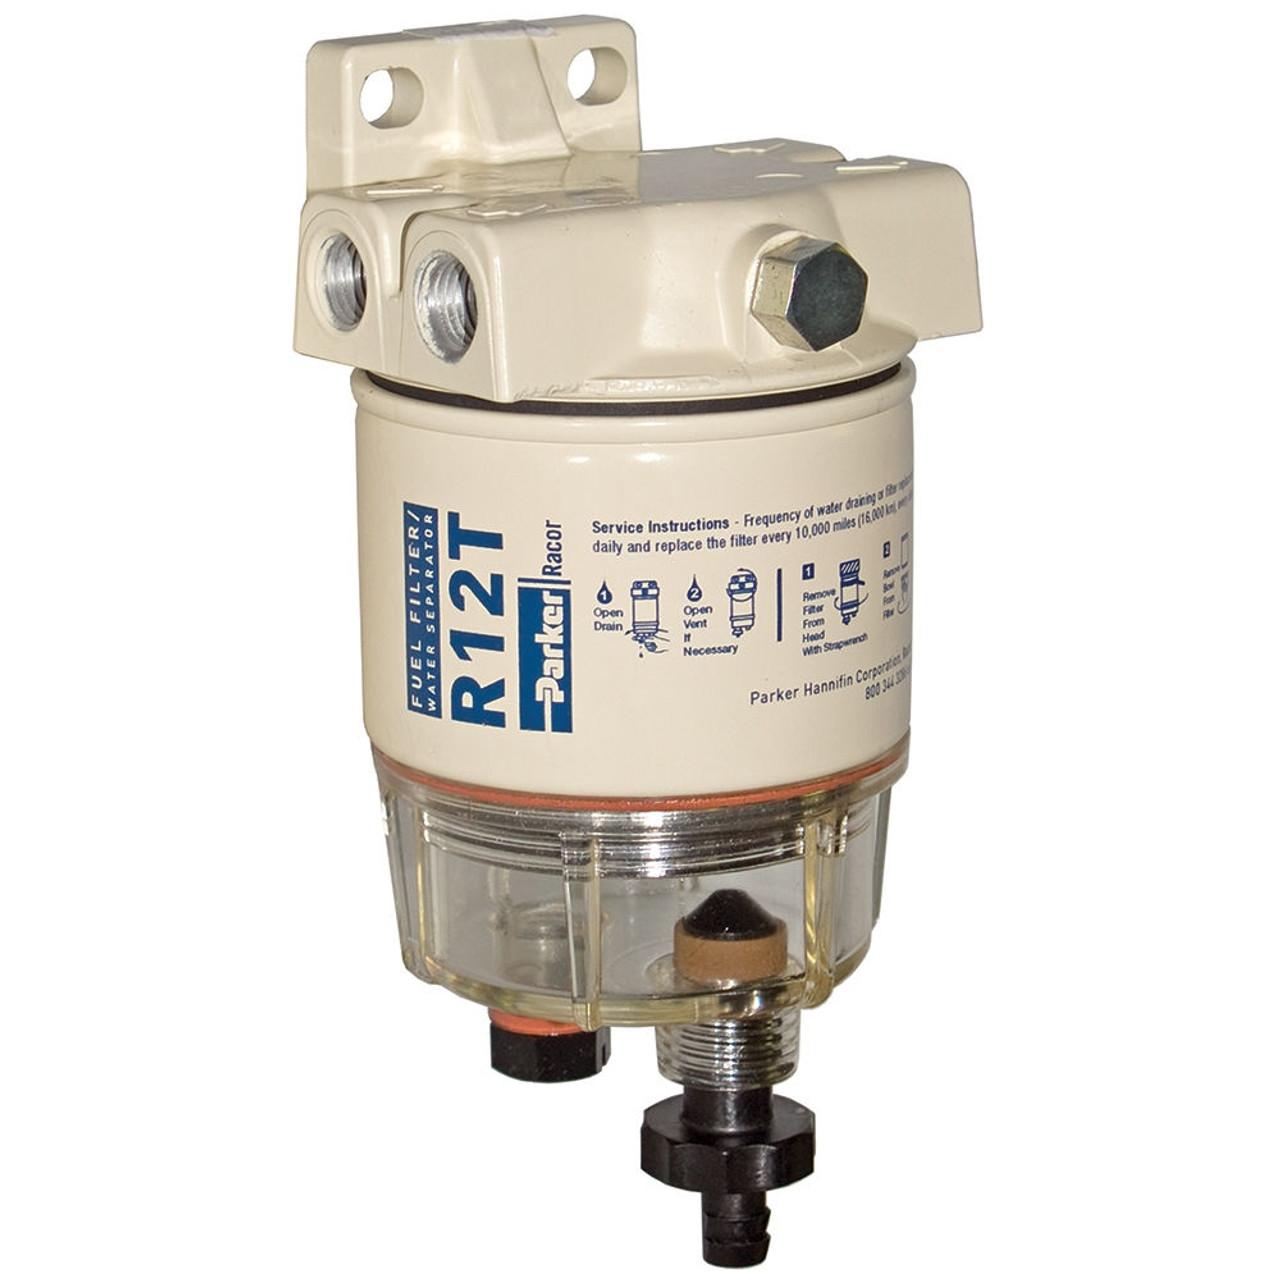 Racor 120a low flow fuel filter water separator filter assembly 10 fuel tank fuel filter racor 120a low flow fuel filter water separator filter assembly 10 micron john m ellsworth co inc